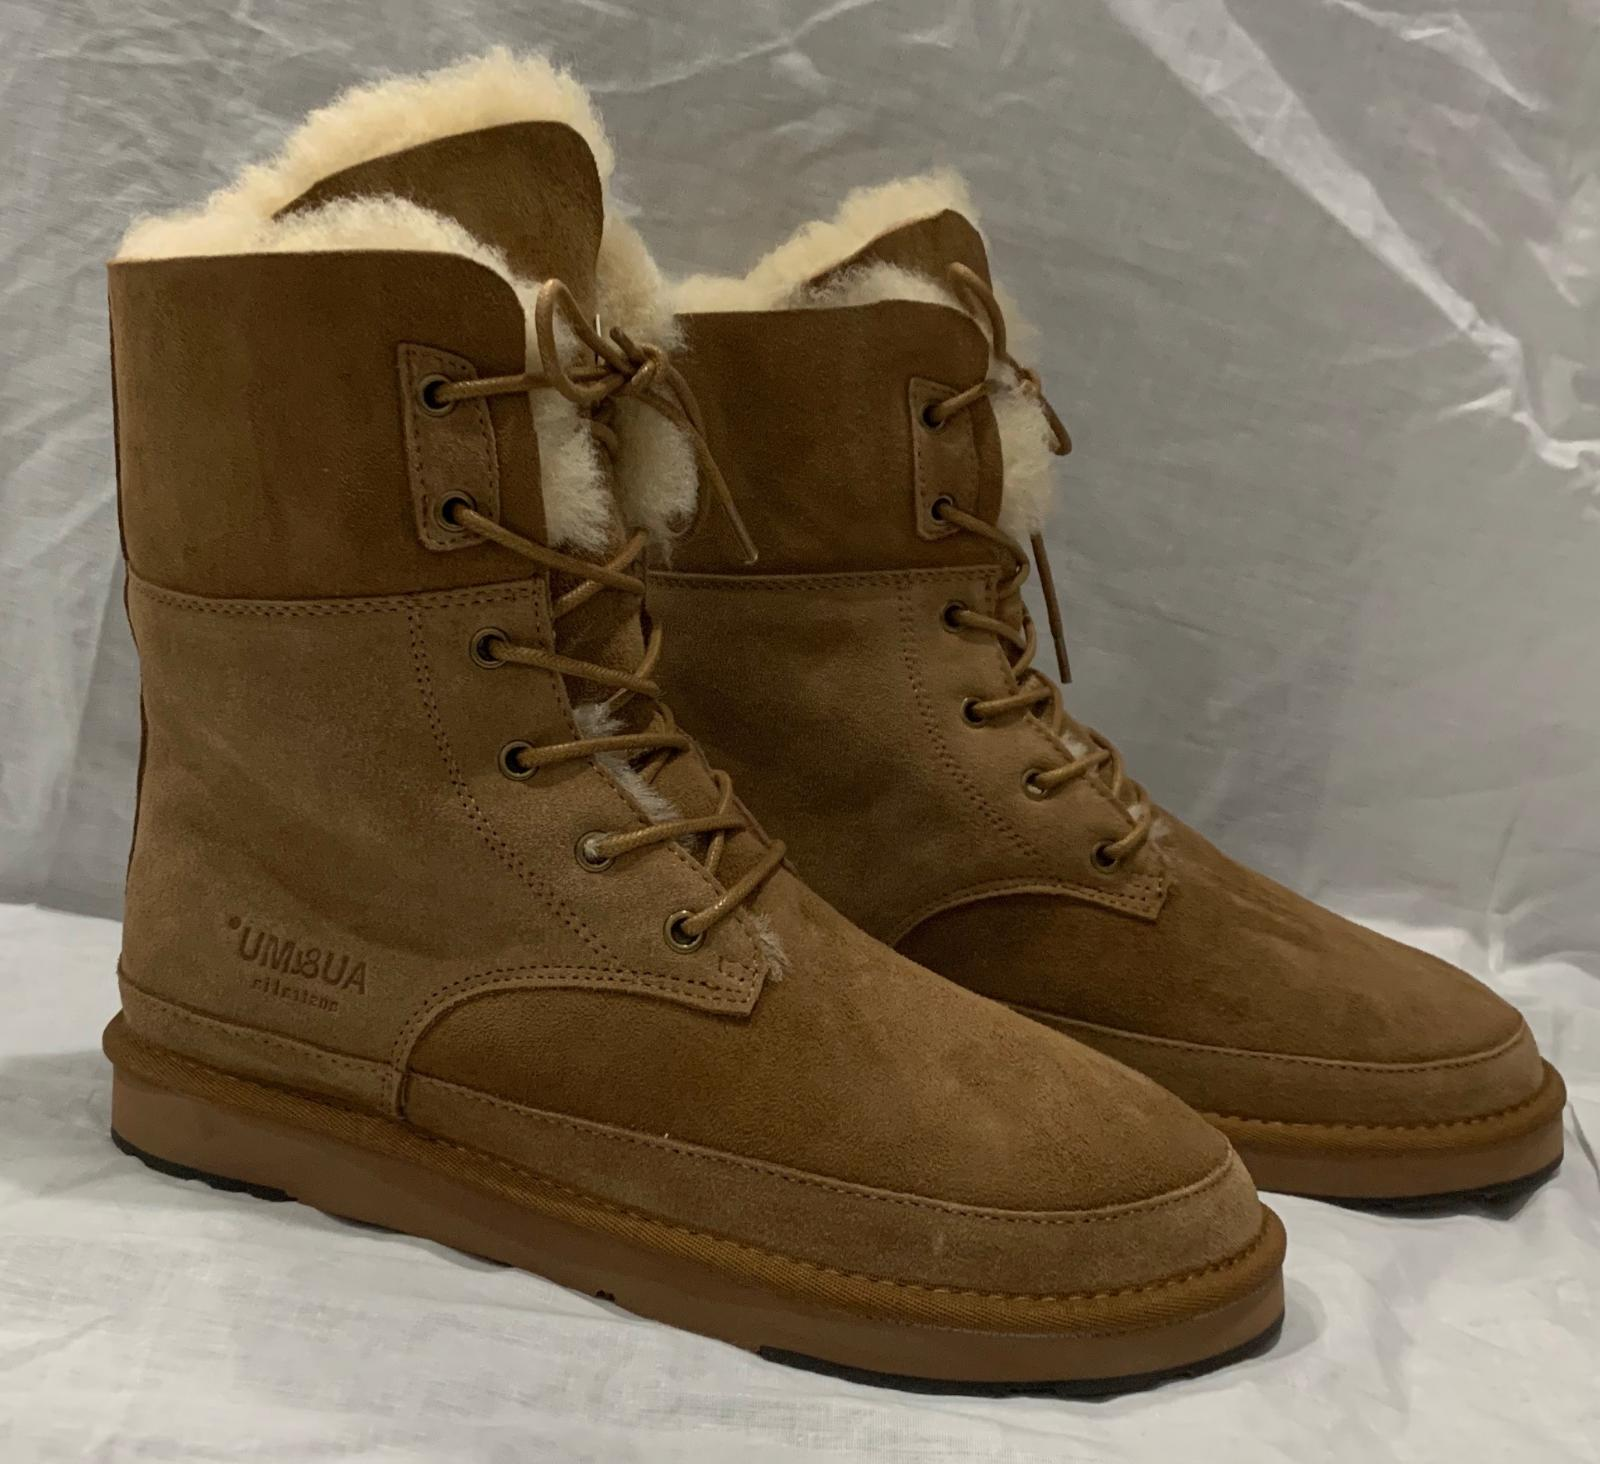 mu Women's Classic Hunter Snow Boots Chestnut Color SIZE 9